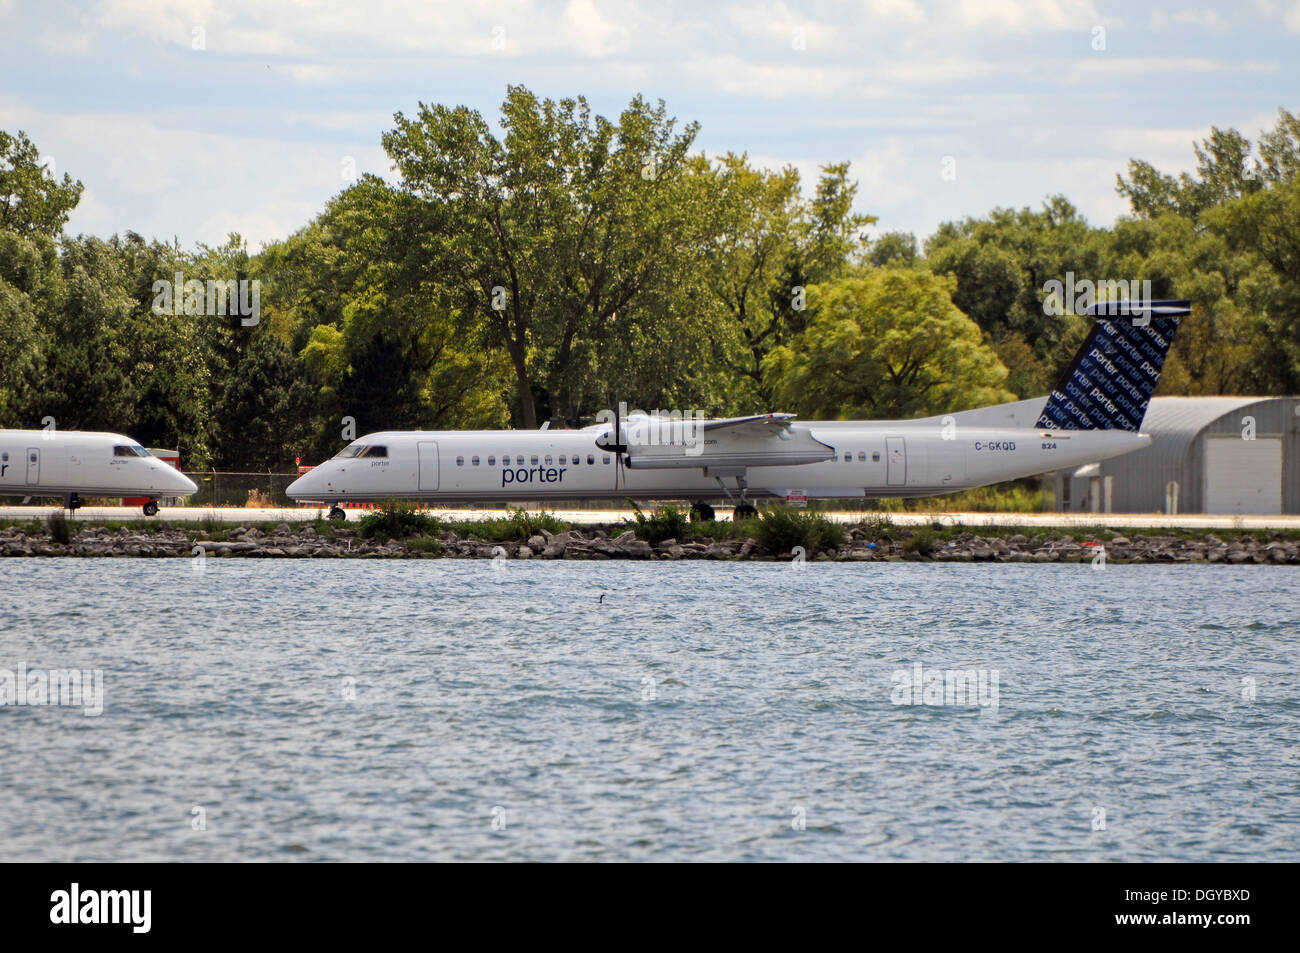 Porter airline,Toronto, Canada - Stock Image